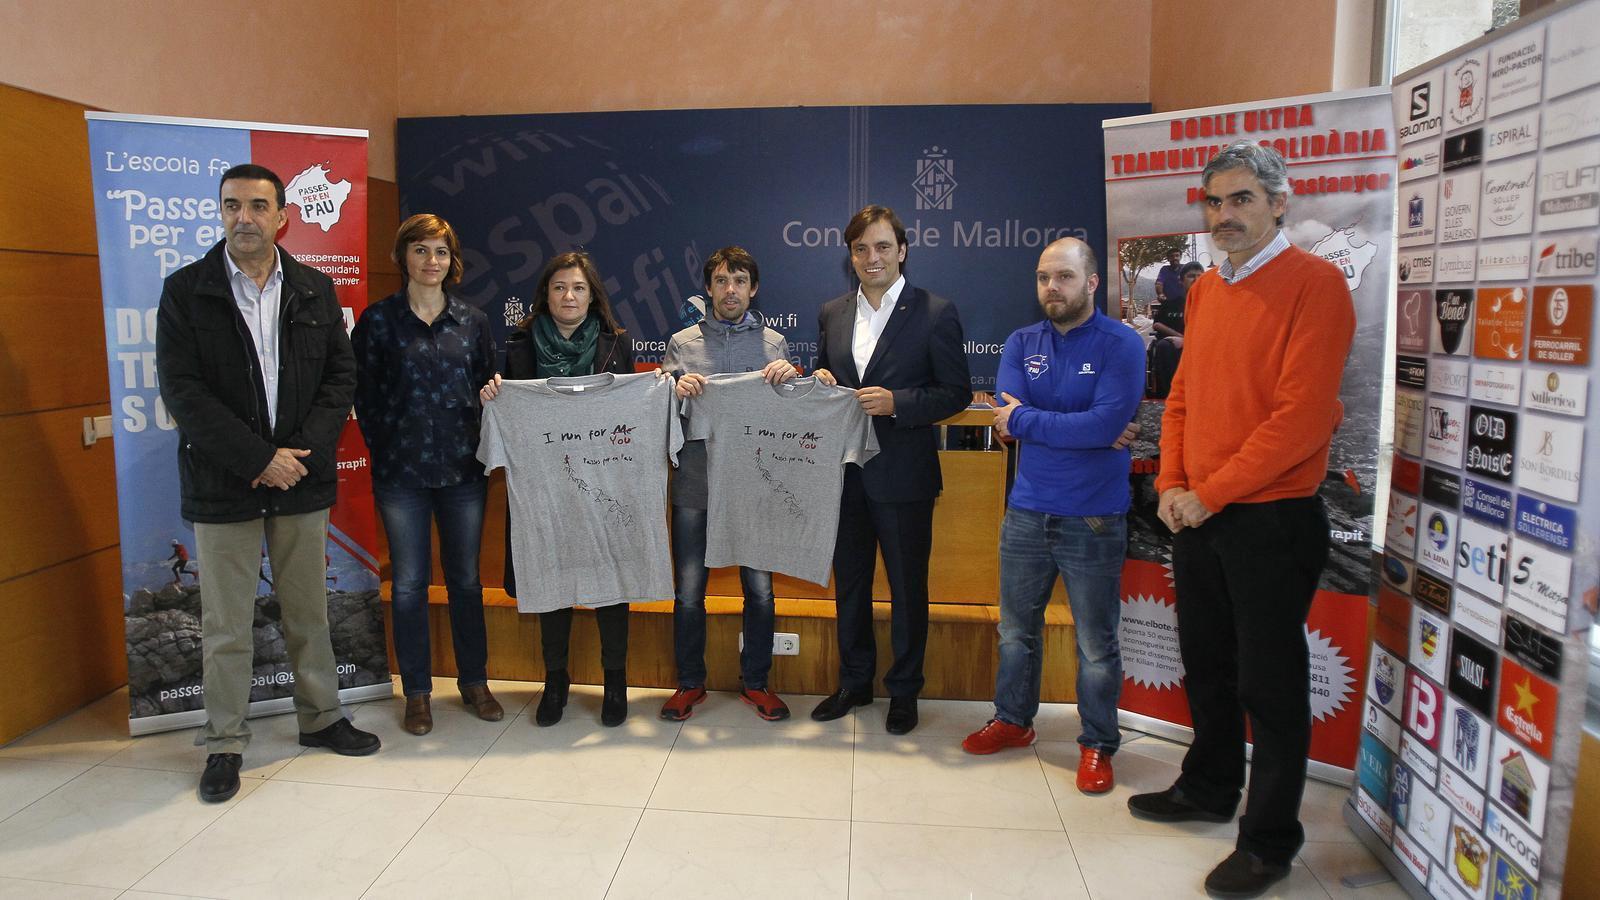 L'esportista Tòfol Castanyer presentant l'acte